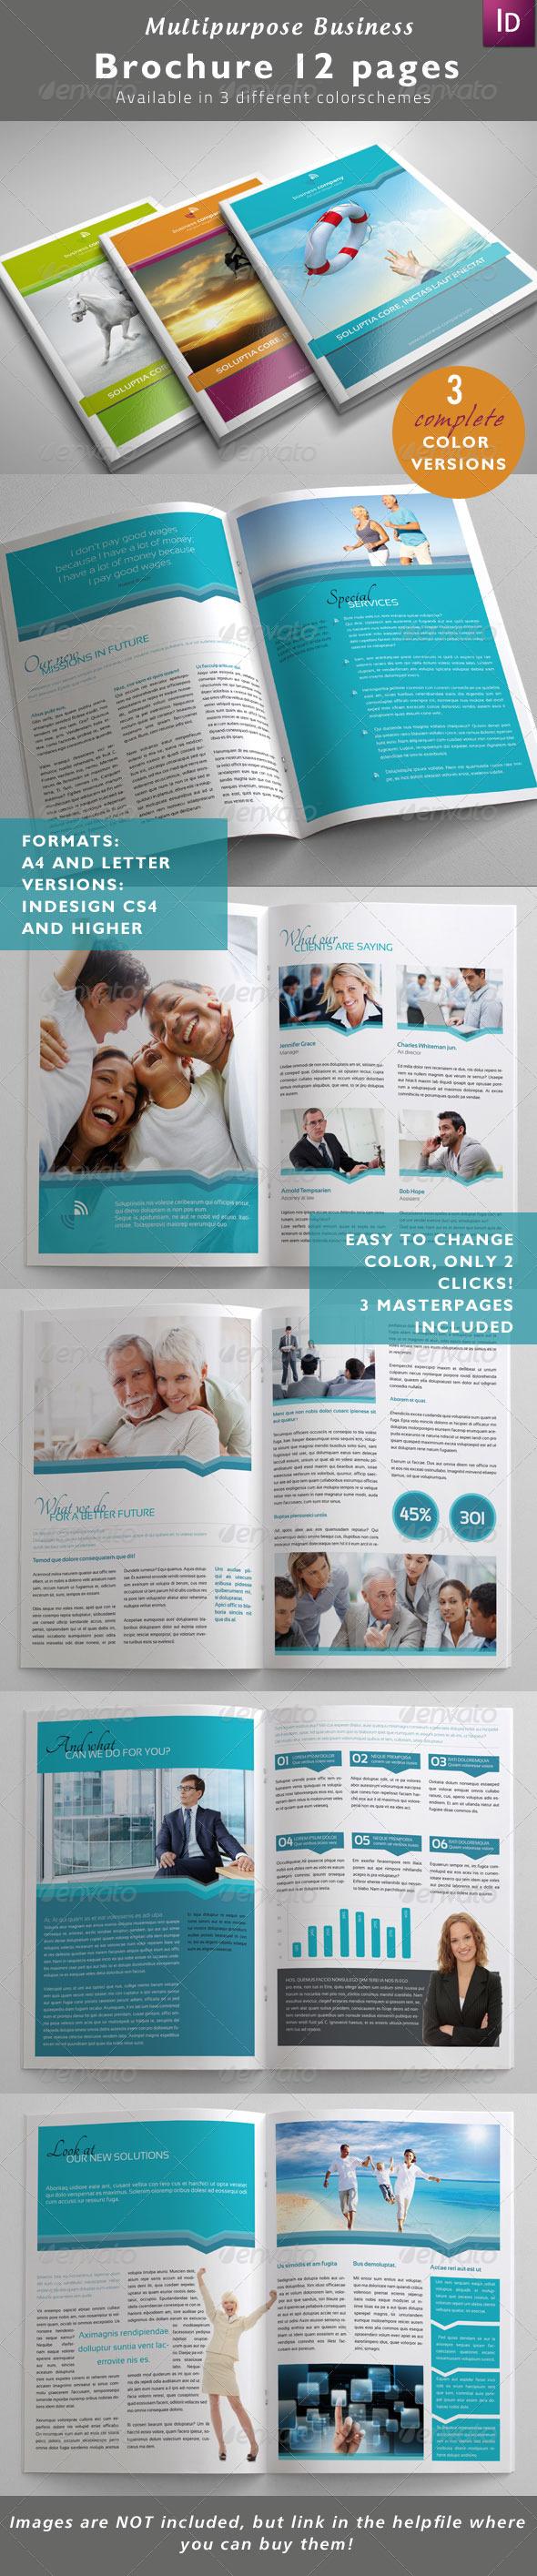 Multipurpose Business Brochure - Corporate Brochures